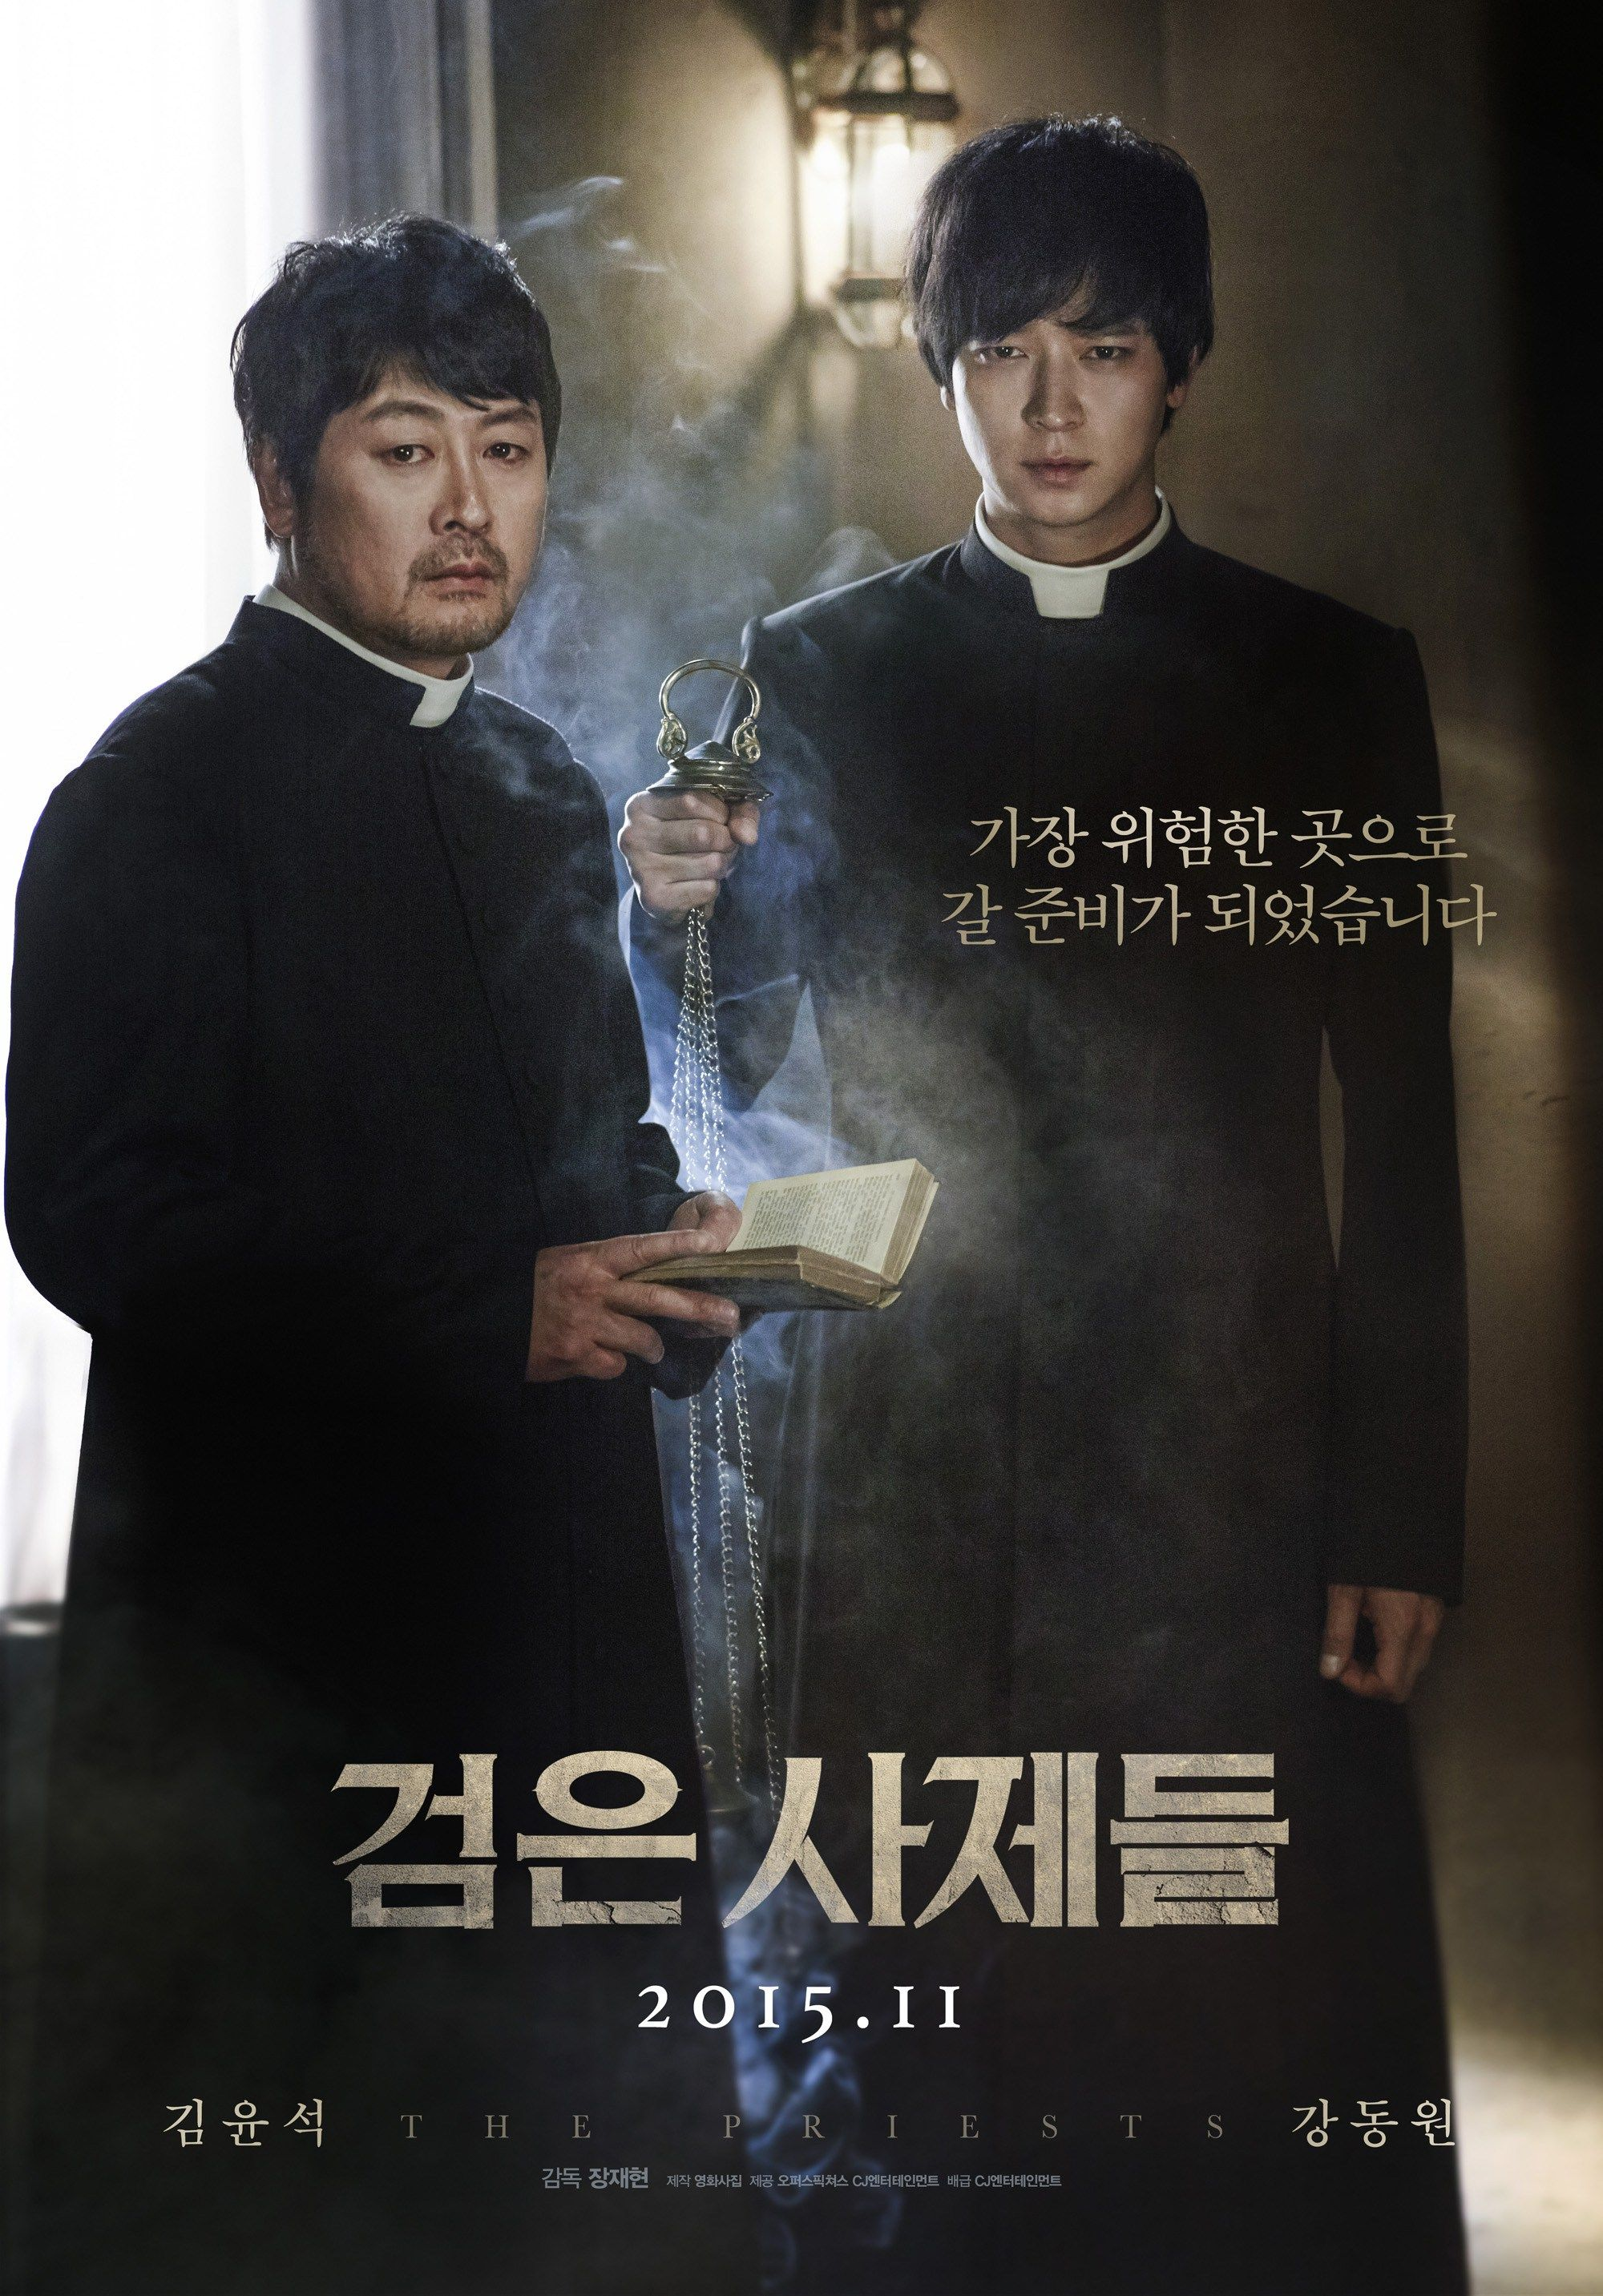 Movie Monday The Priests (2015) Kang dong won, Drama